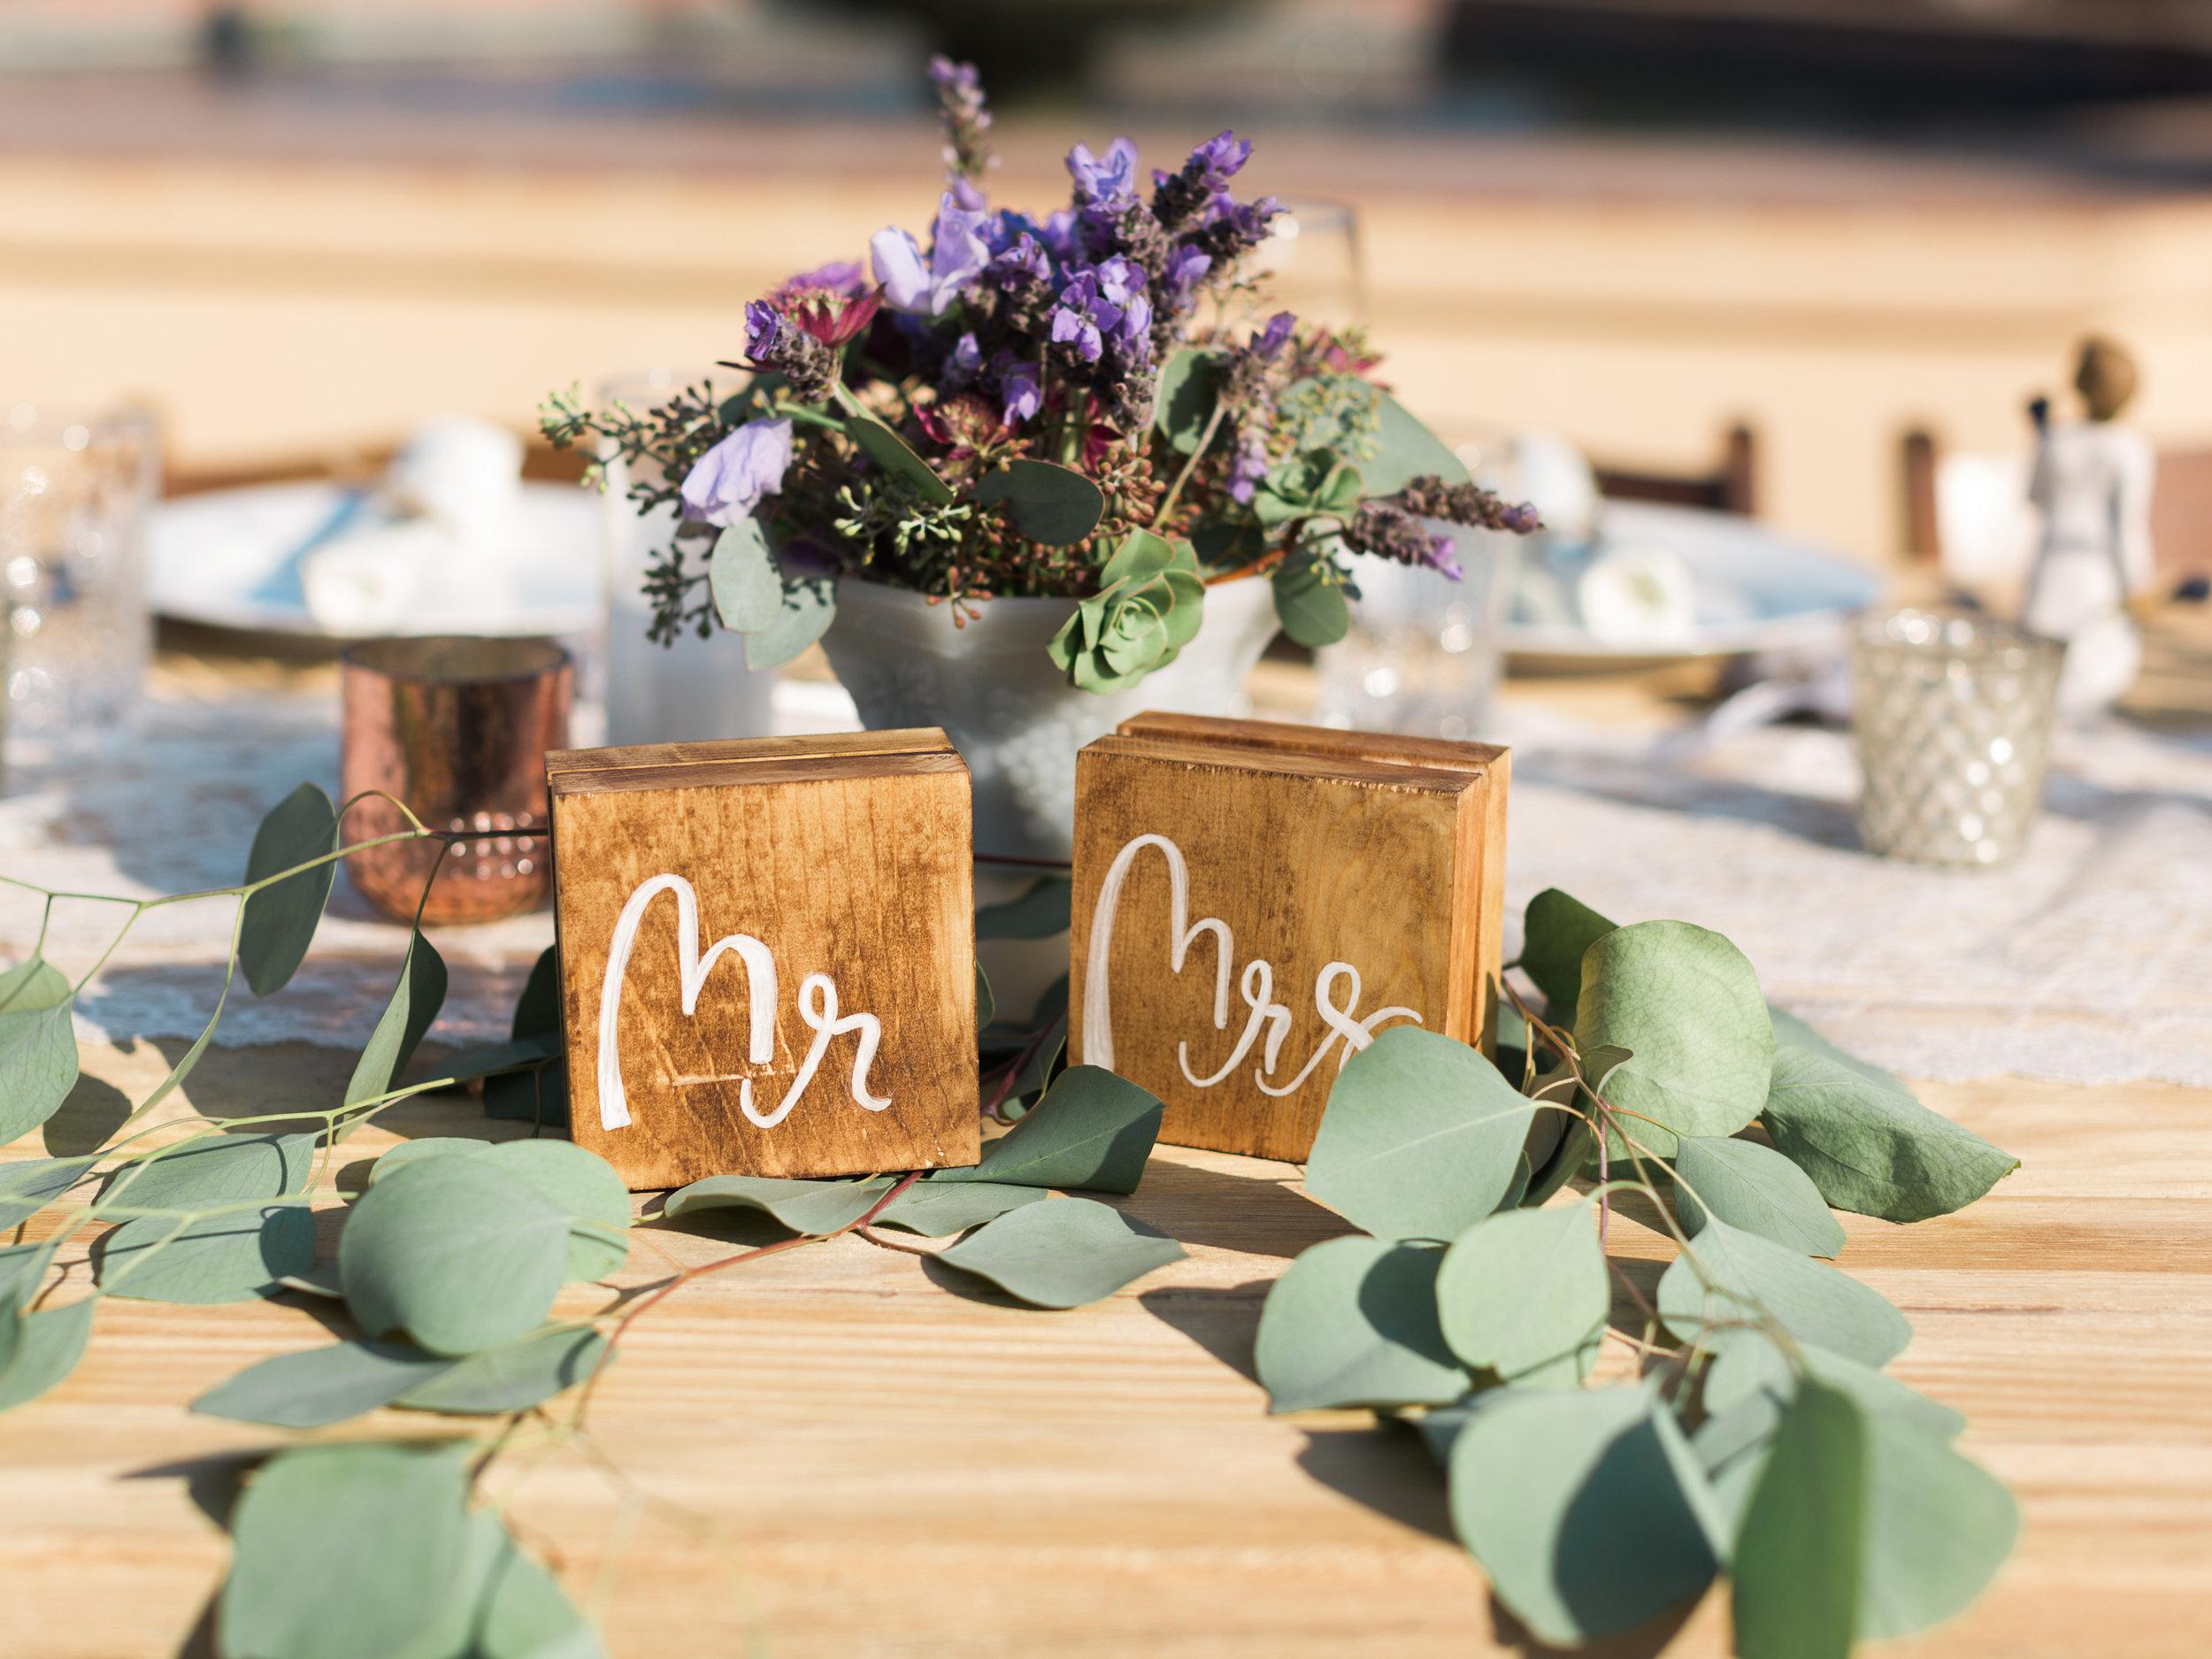 santabarbarawedding.com | Photo: Kiel Rucker | Lavender and lace wedding ideas at Santa Barbara Historical Museum